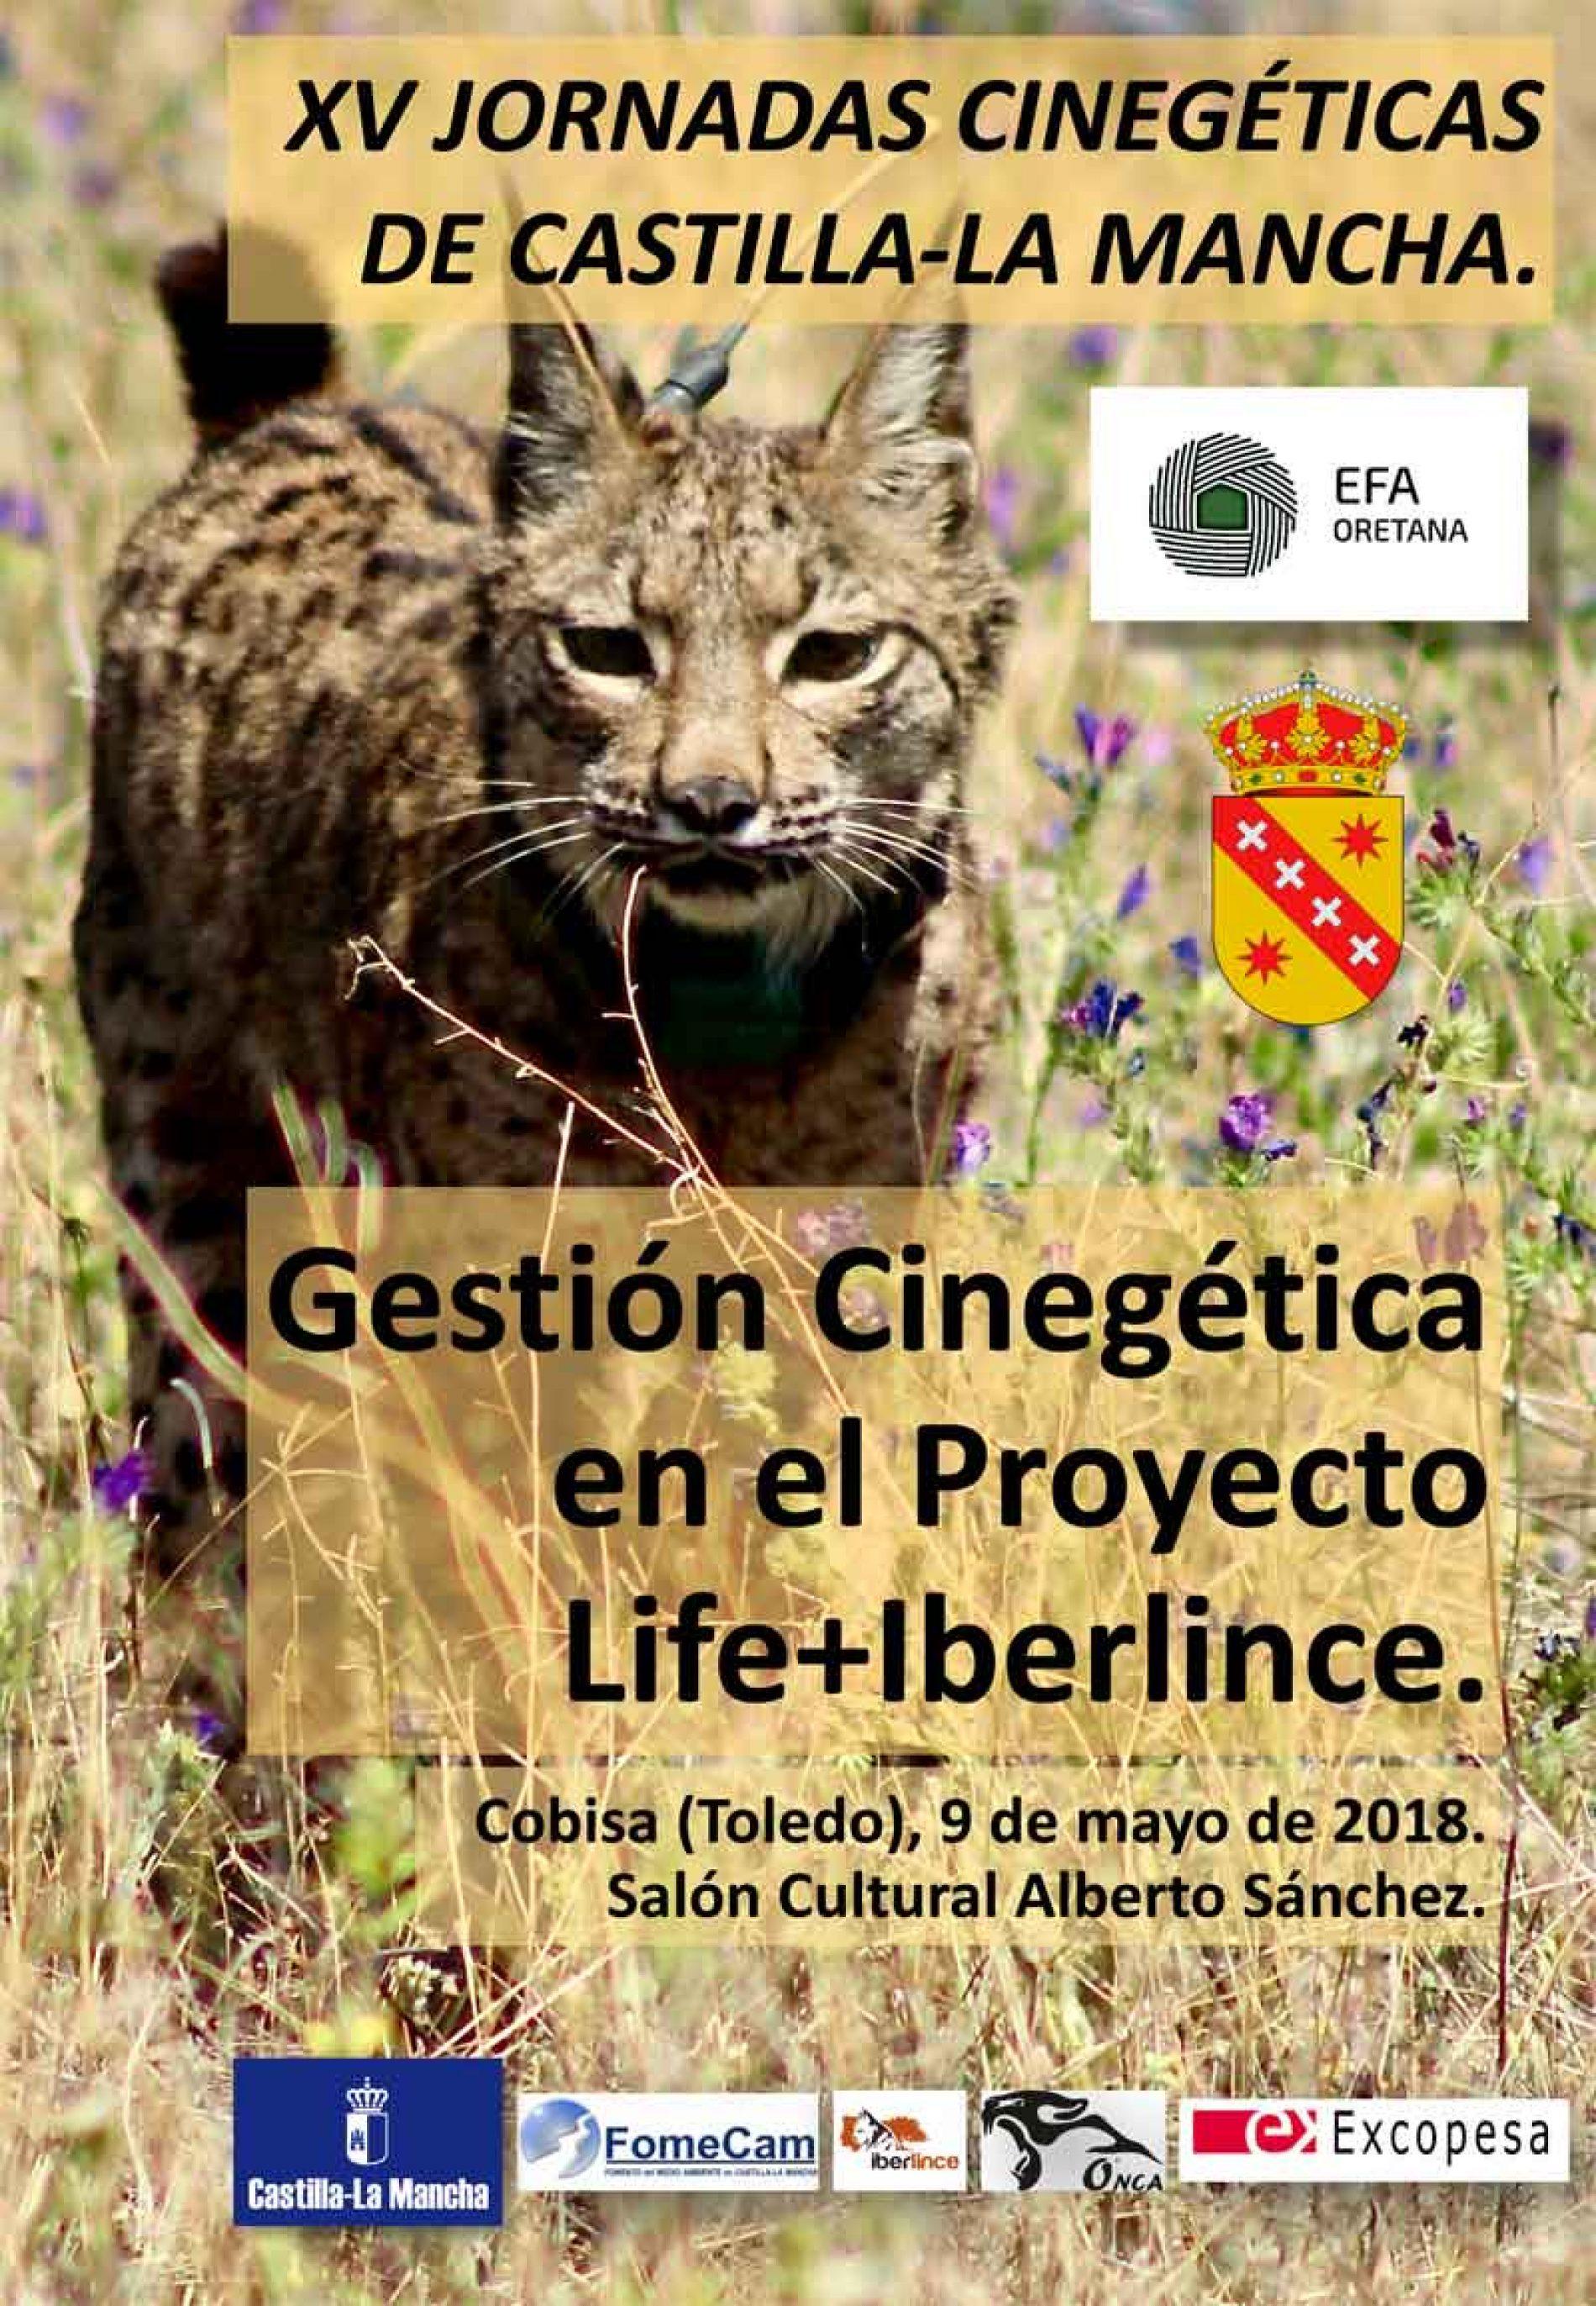 XV Jornadas cinegéticas de Castilla-La Mancha